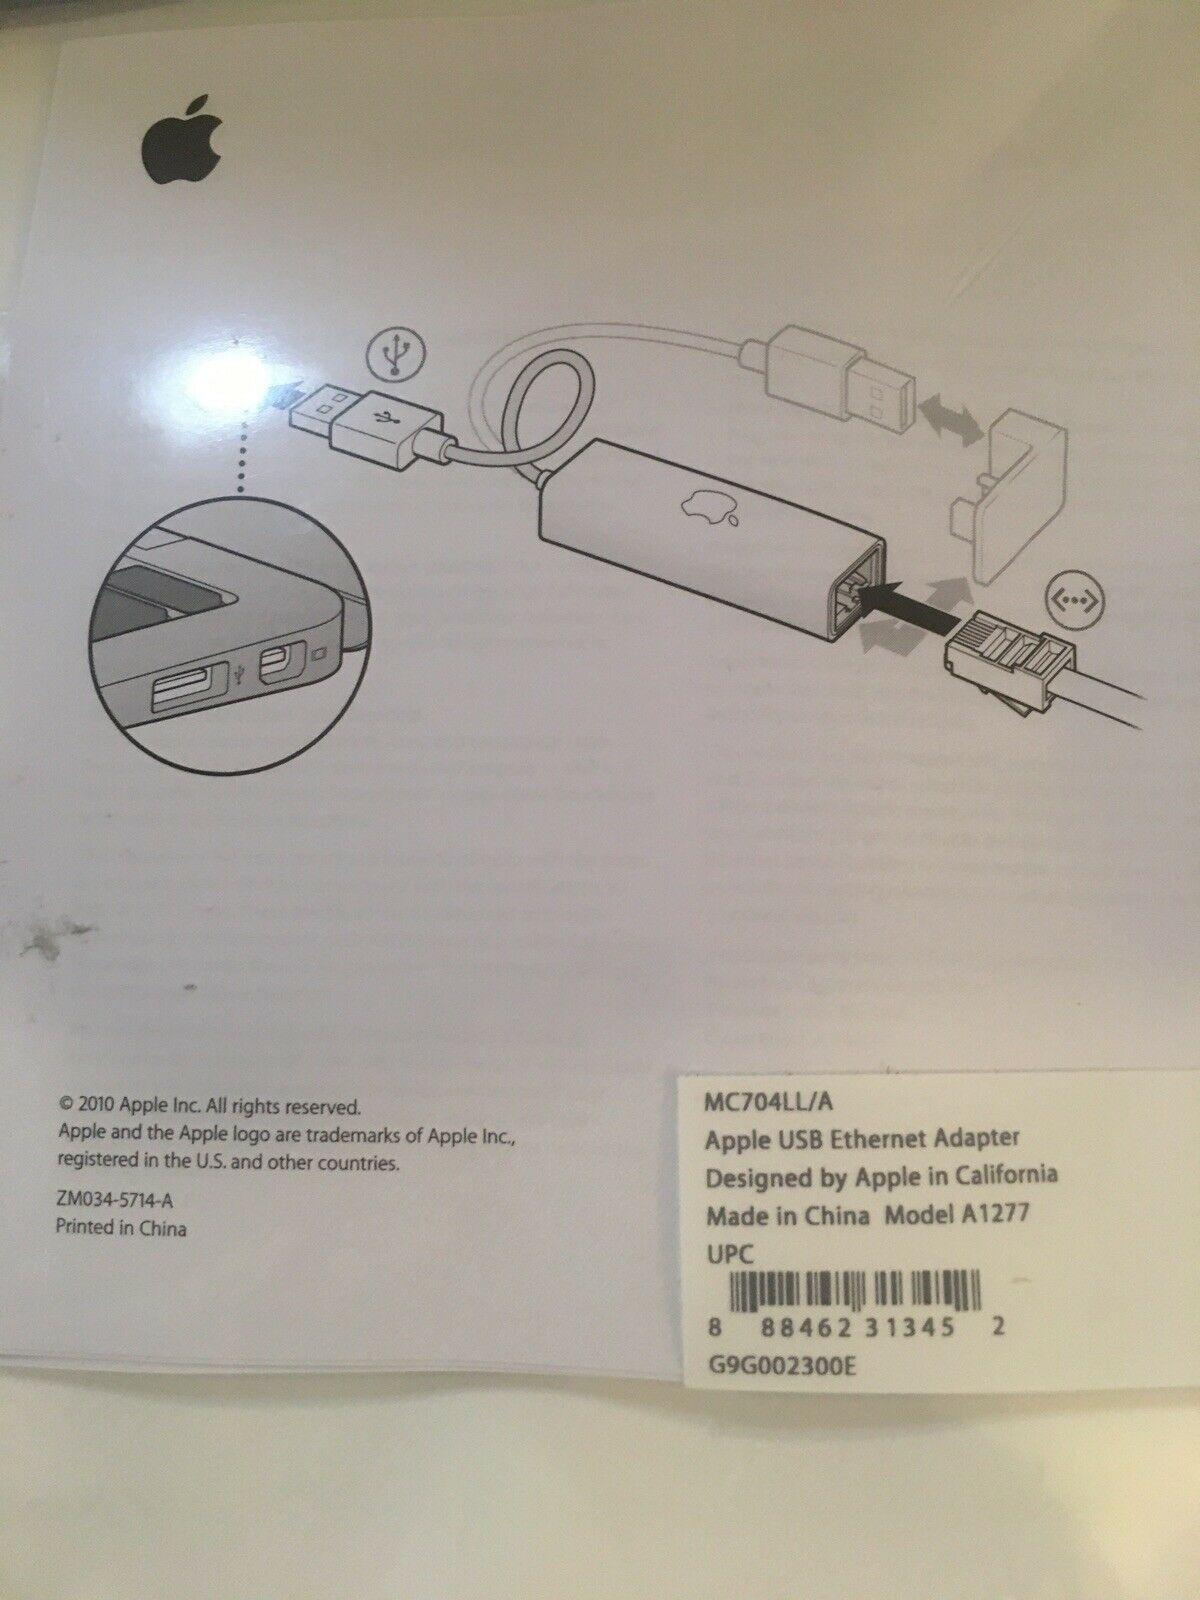 New-Apple-USB-Ethernet-Adapter-MC704LL-A-Model-A1277